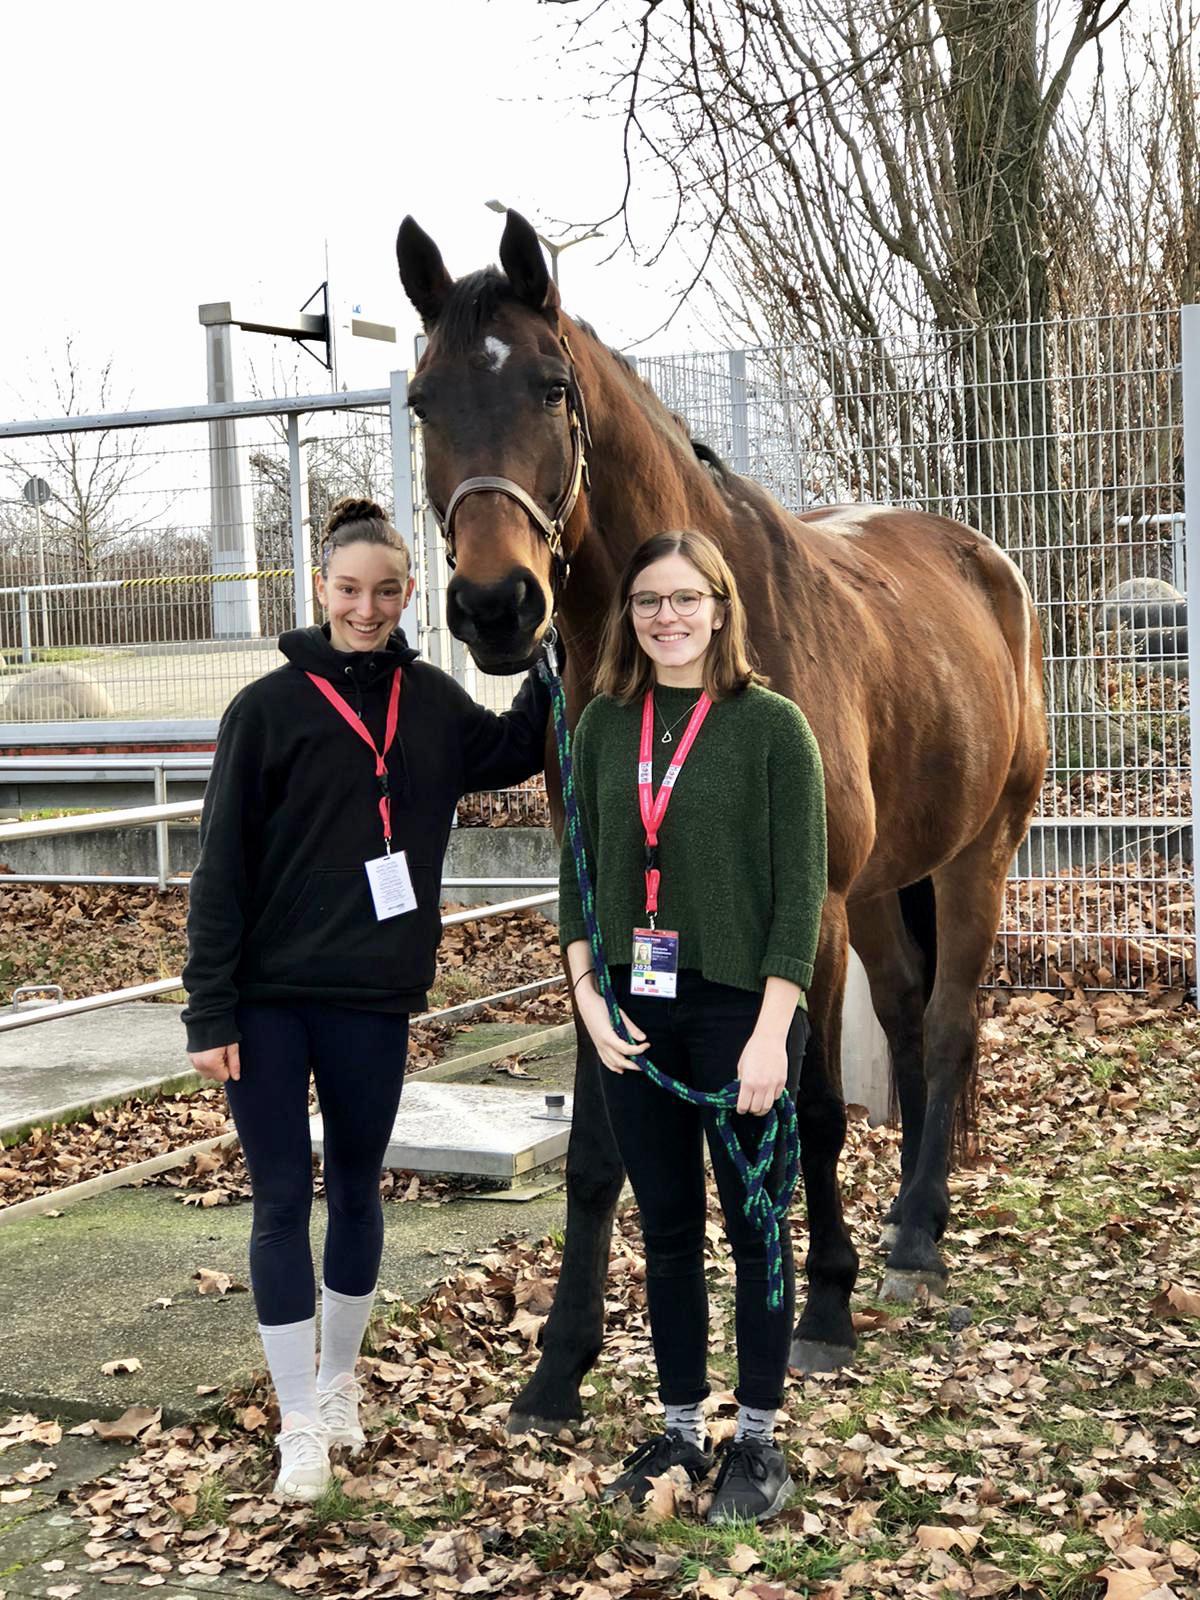 Alina Ross, professional Equestrian